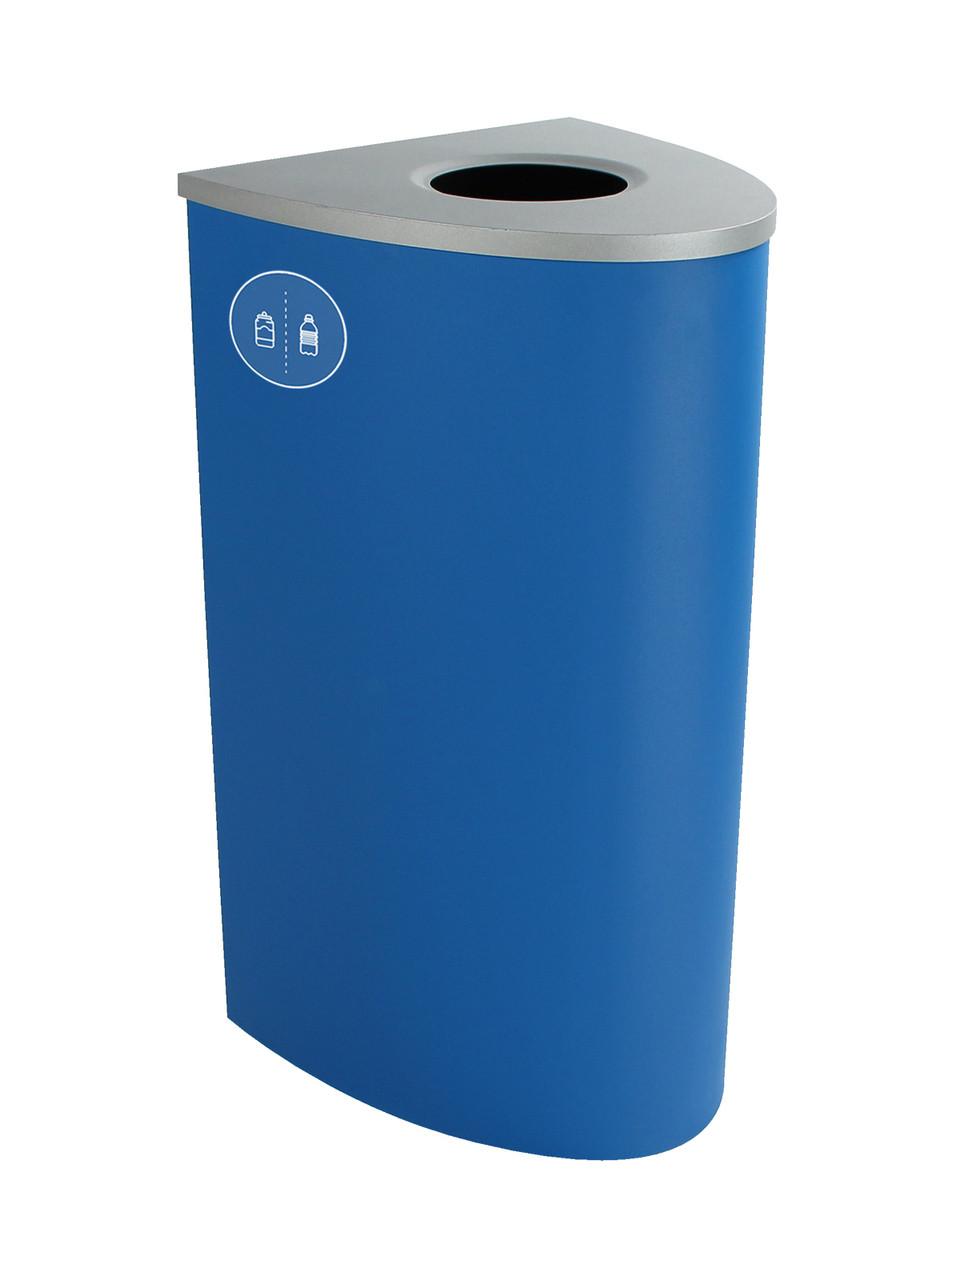 22 Gallon Steel Spectrum Ellipse Bottles & Cans Collector Blue 8107000-1